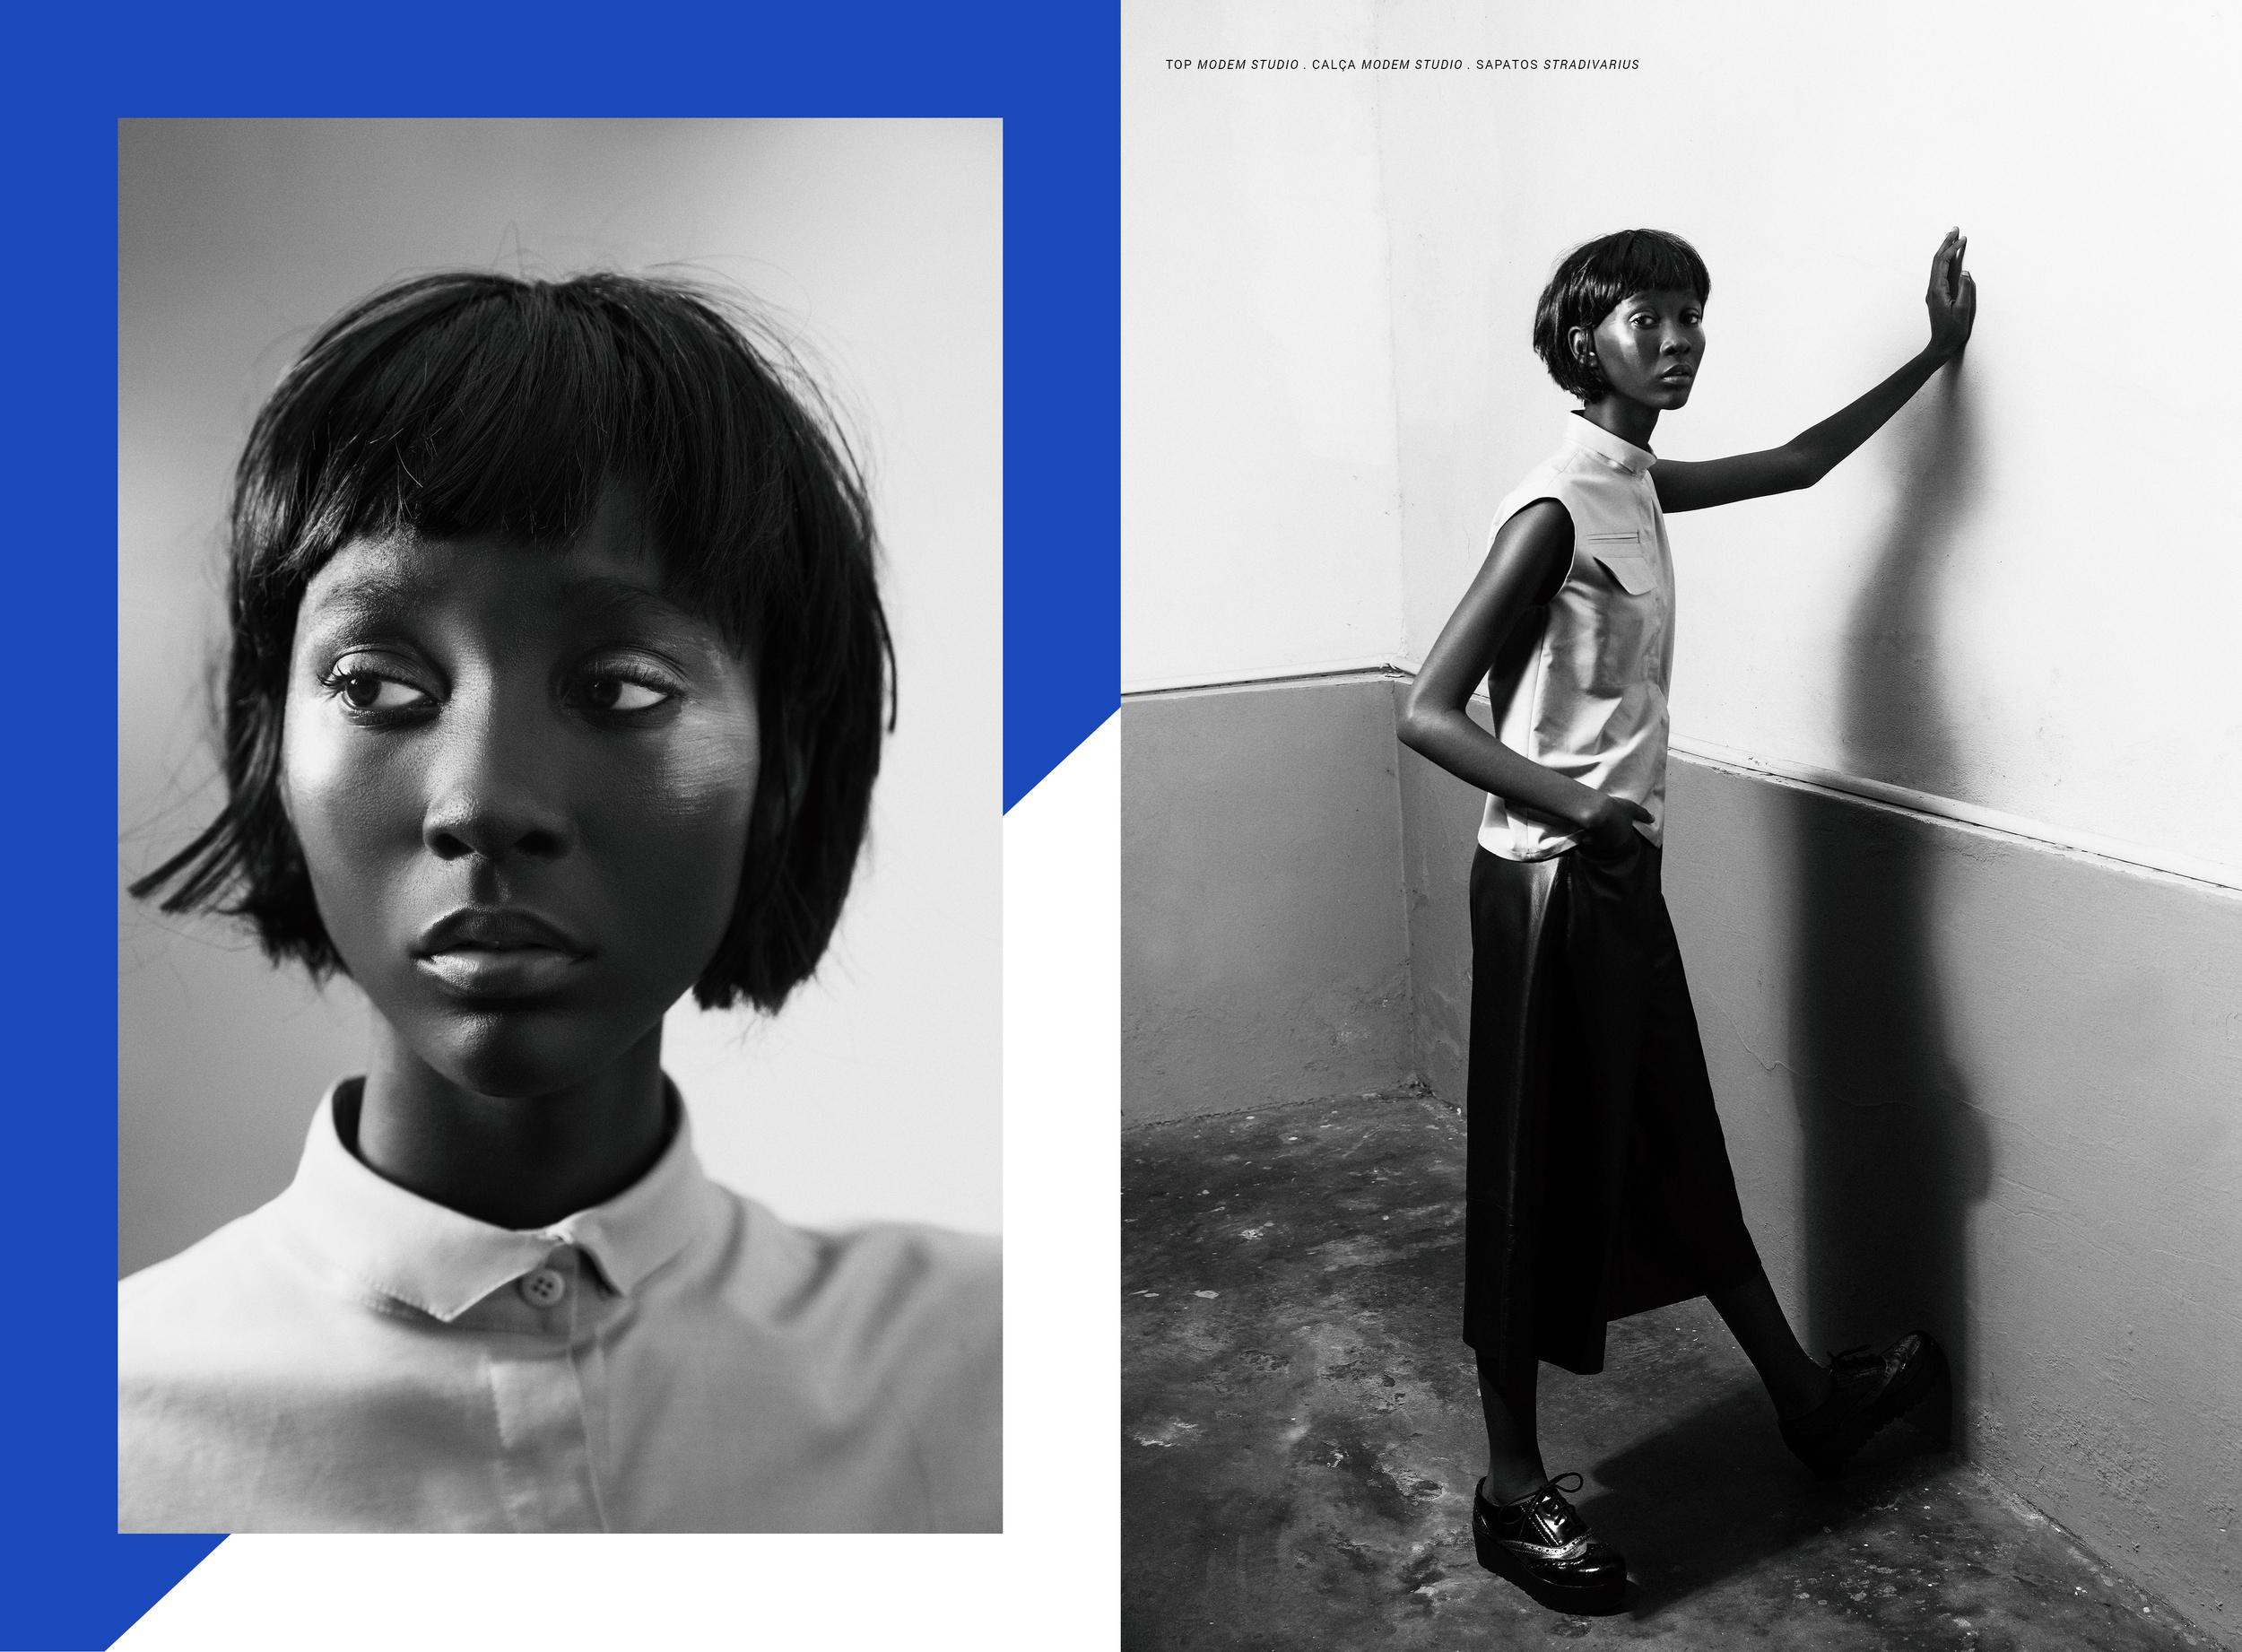 editorial-minimal-final-dupla2.jpg